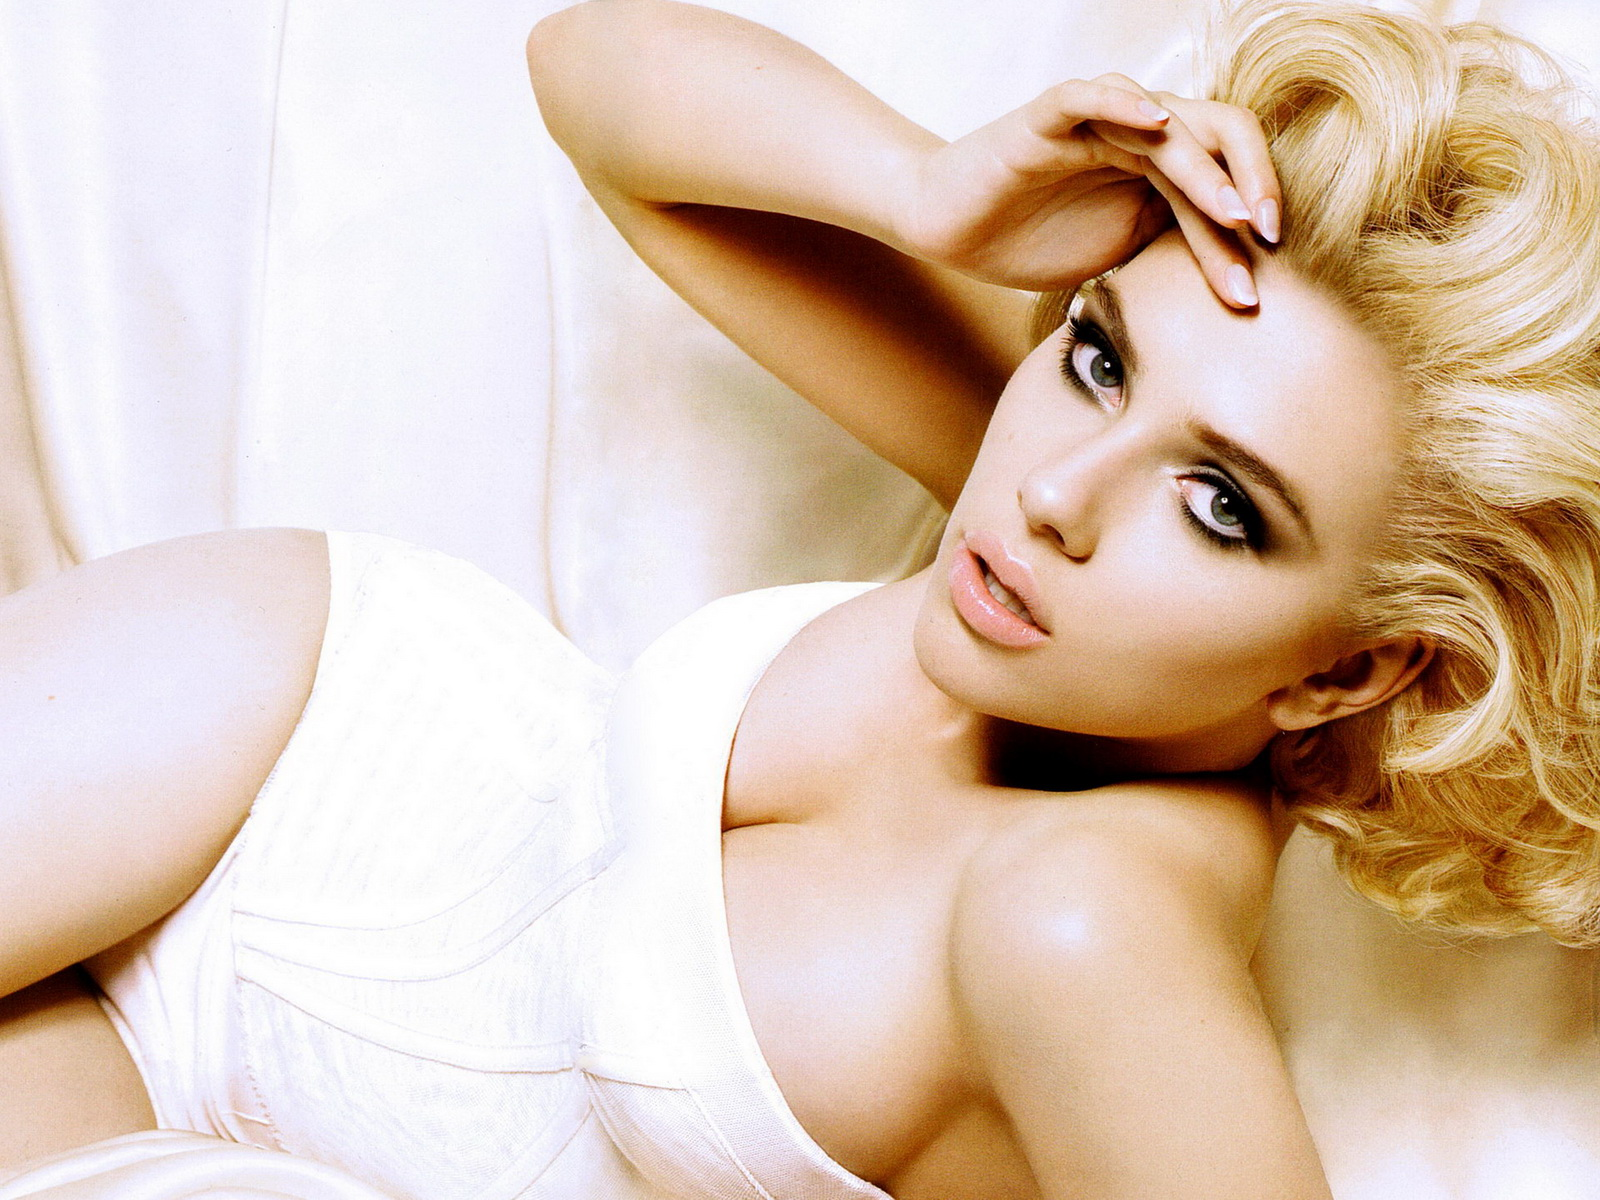 http://1.bp.blogspot.com/_9Izdq8bedtQ/TVIAGm66mhI/AAAAAAAAjoc/UoloshBhTLc/s1600/Scarlett-Johansson-sexy-pictures-25.jpg